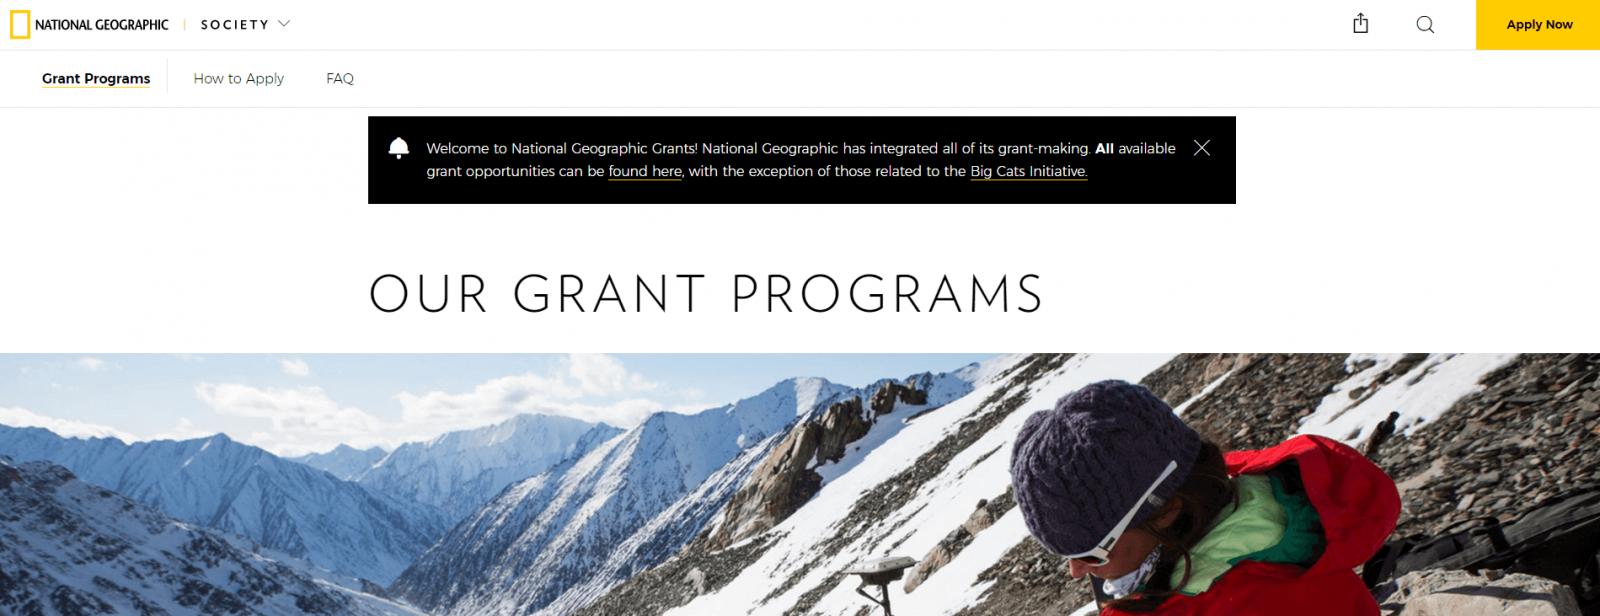 natinal geographic home page portfolio fotografico